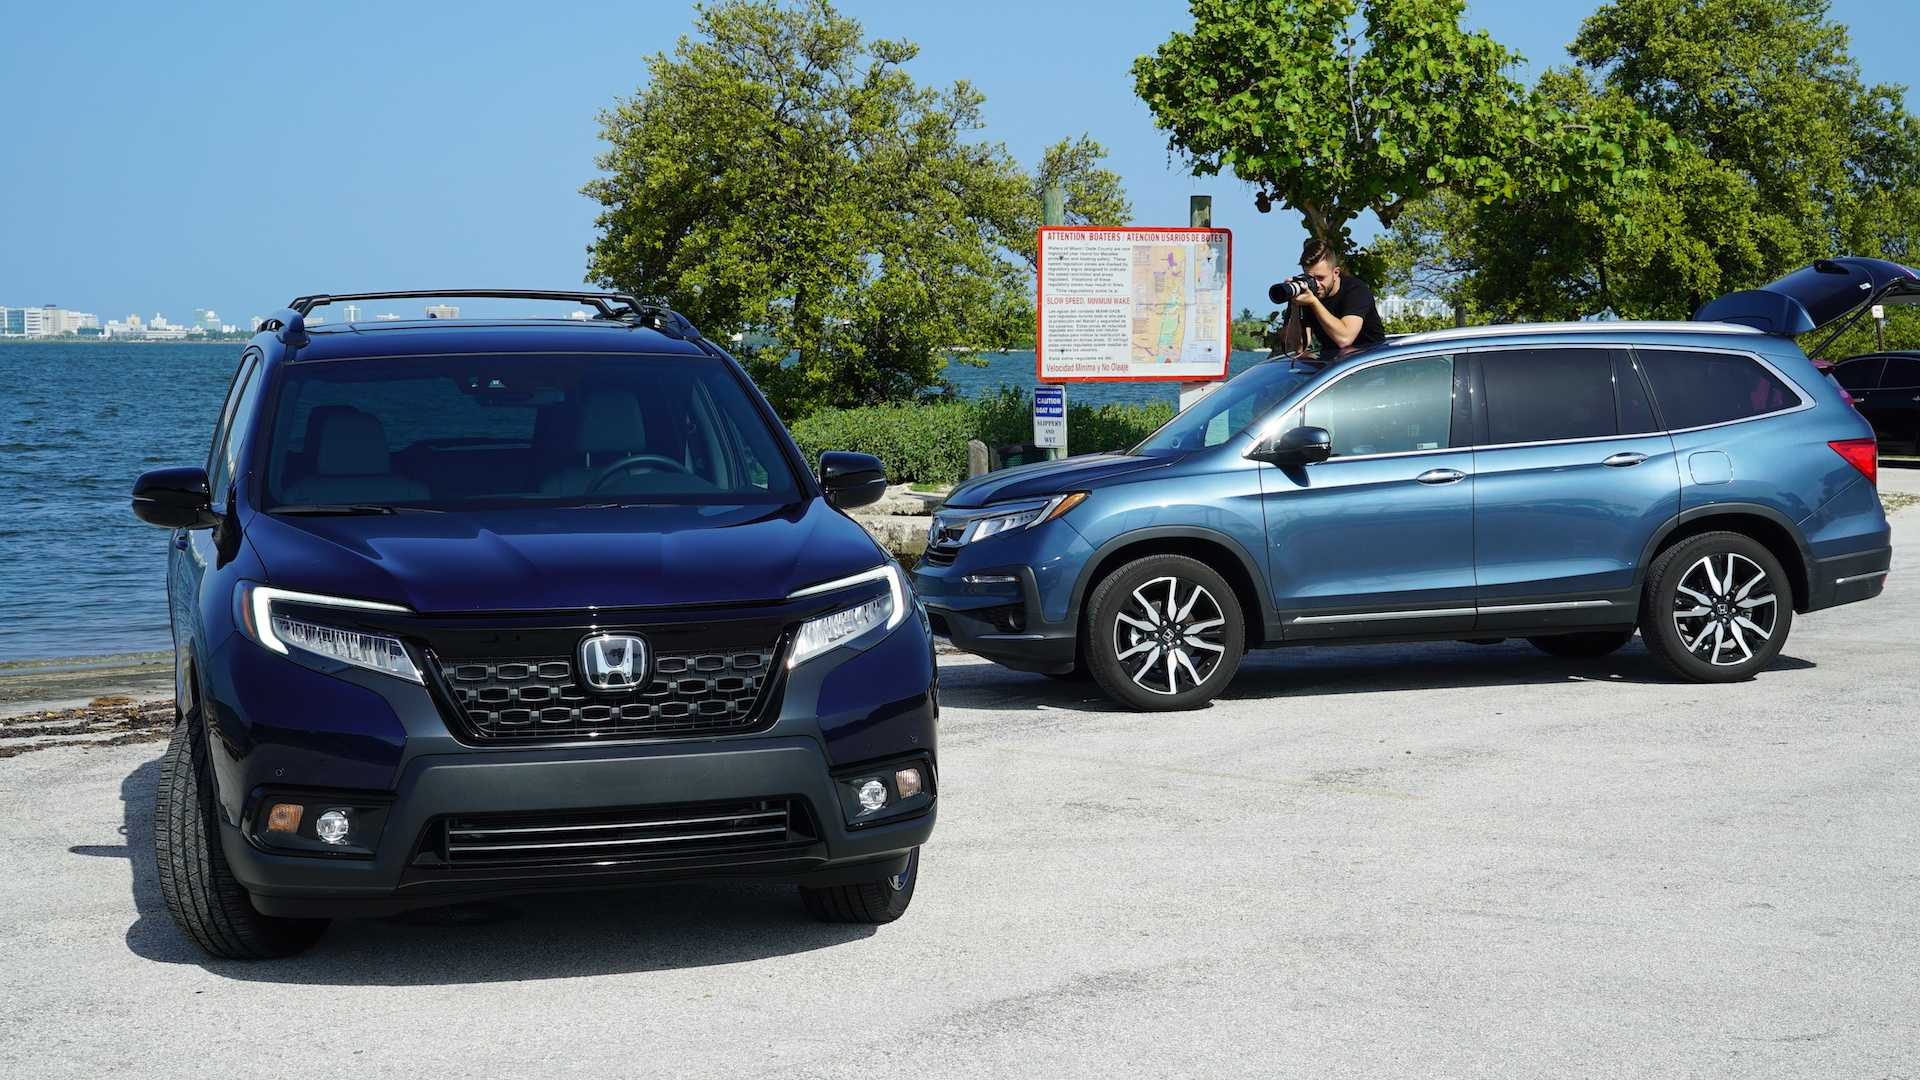 Long-Term Honda Pilot Update: Perfect Production Vehicle